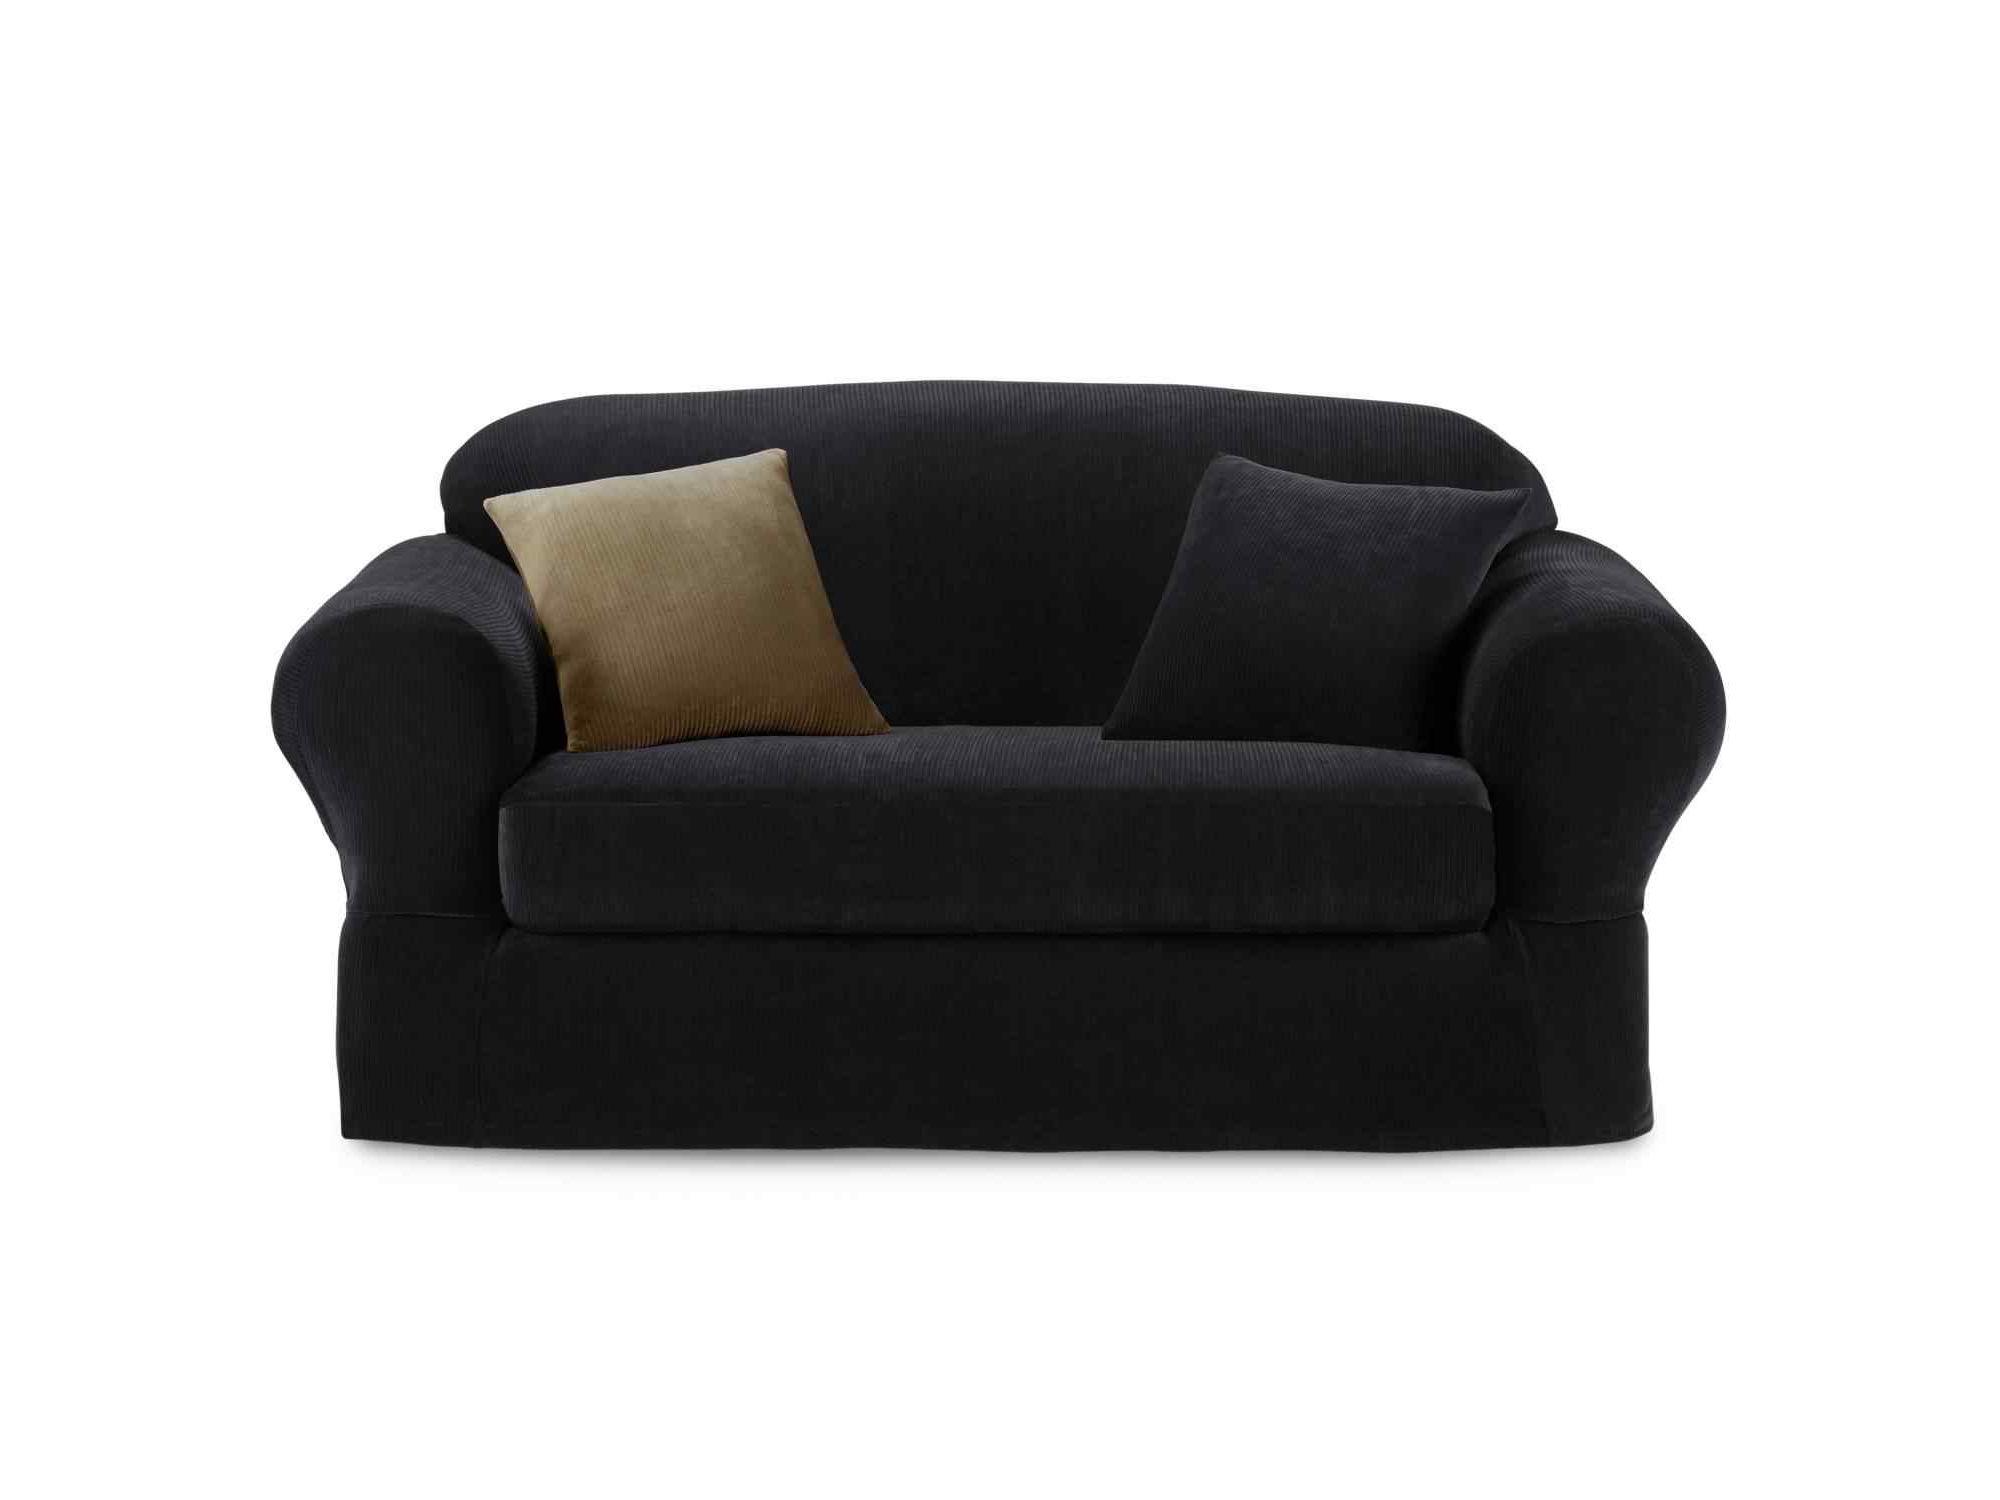 UPC Maytex Studio Collin 2 pc Stretch Ribbed Sofa